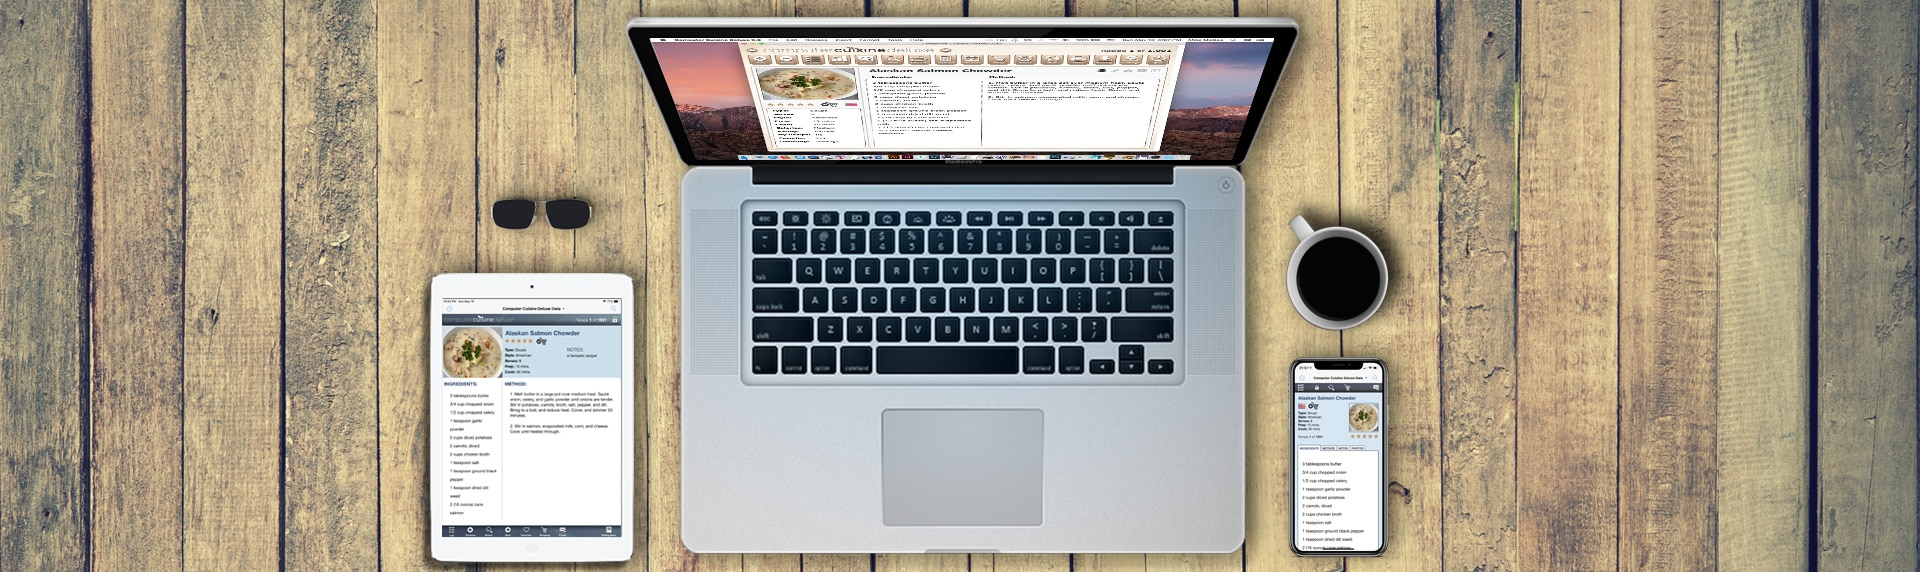 computer cuisine laptop mac recipe software version 9 MacBook Pro macOS MacBook Pro iPhone iPad